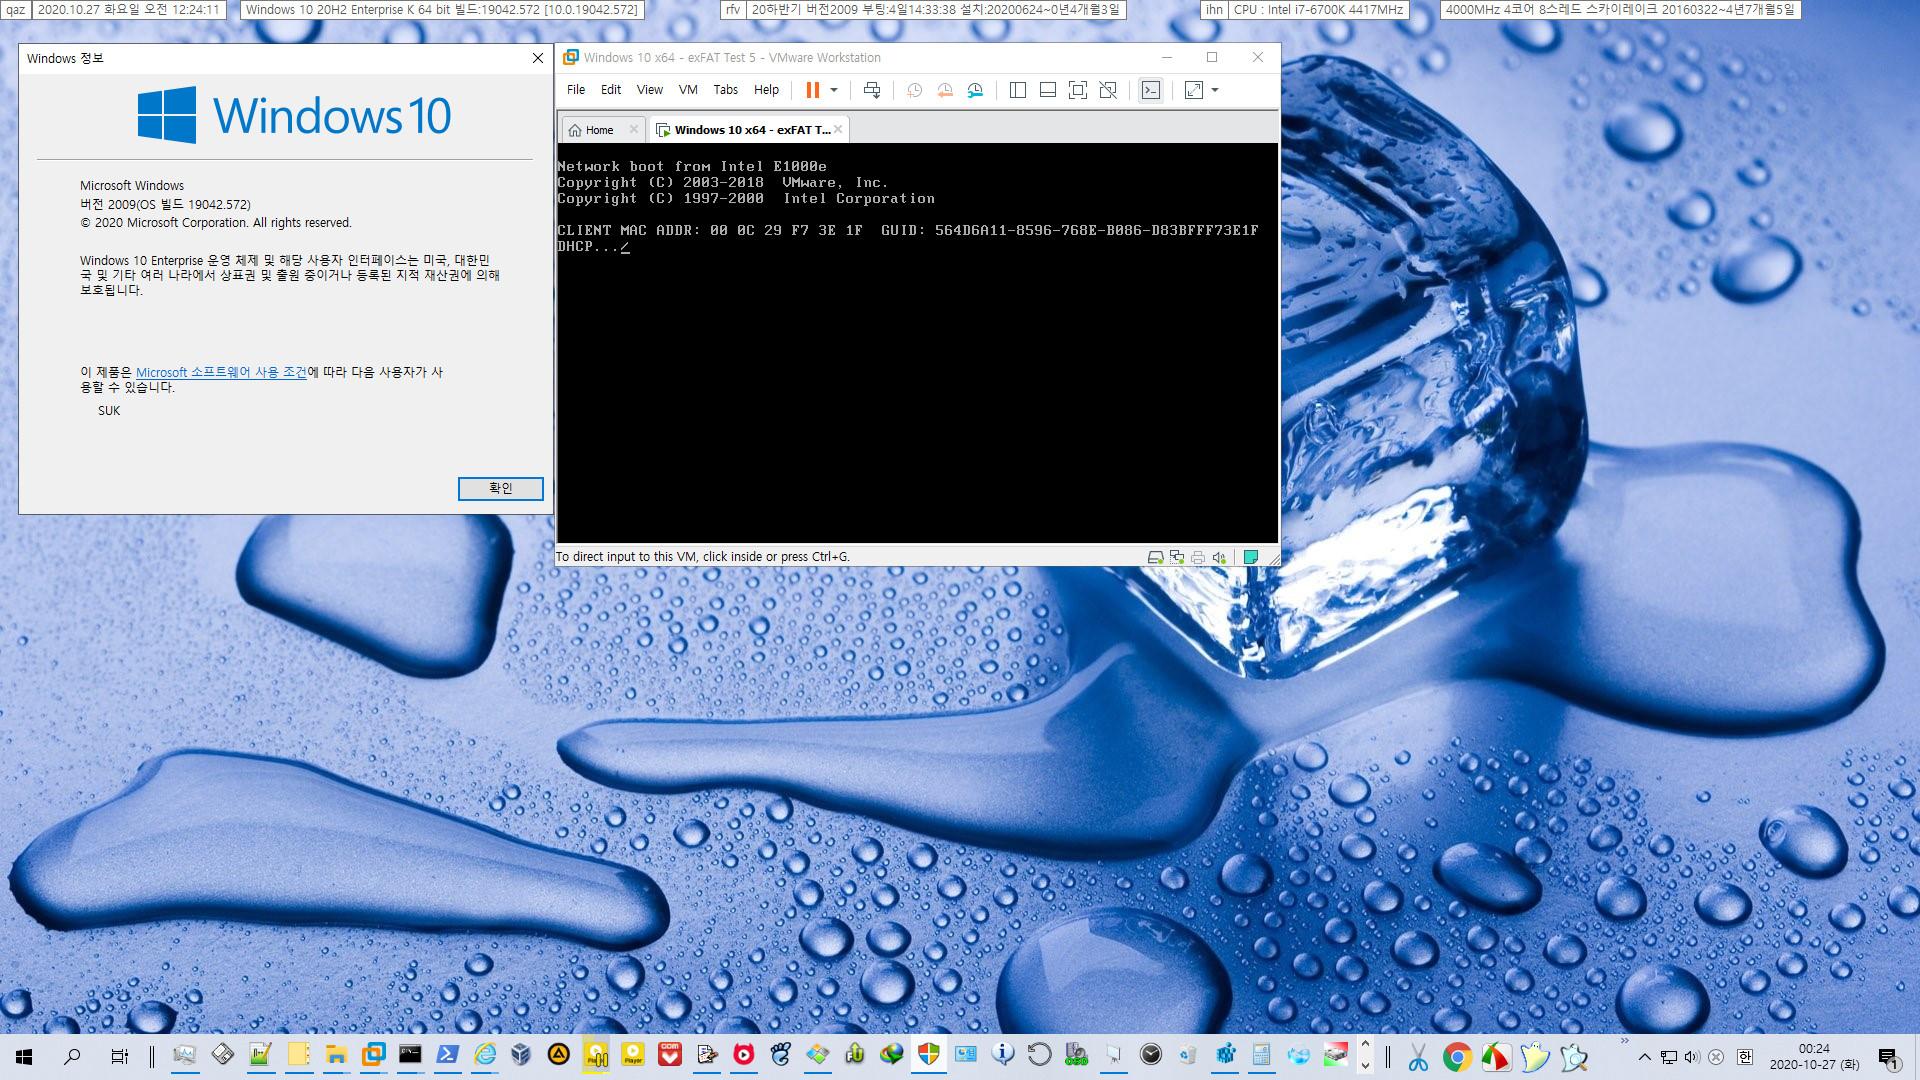 exFAT 포맷으로도 VHD 부팅이 Windows 10 버전 1903부터 된다고 하여 테스트 - 생고생만 하다가 컴퓨터 먹통 2번이나 되고 그만뒀습니다 2020-10-27_002411.jpg